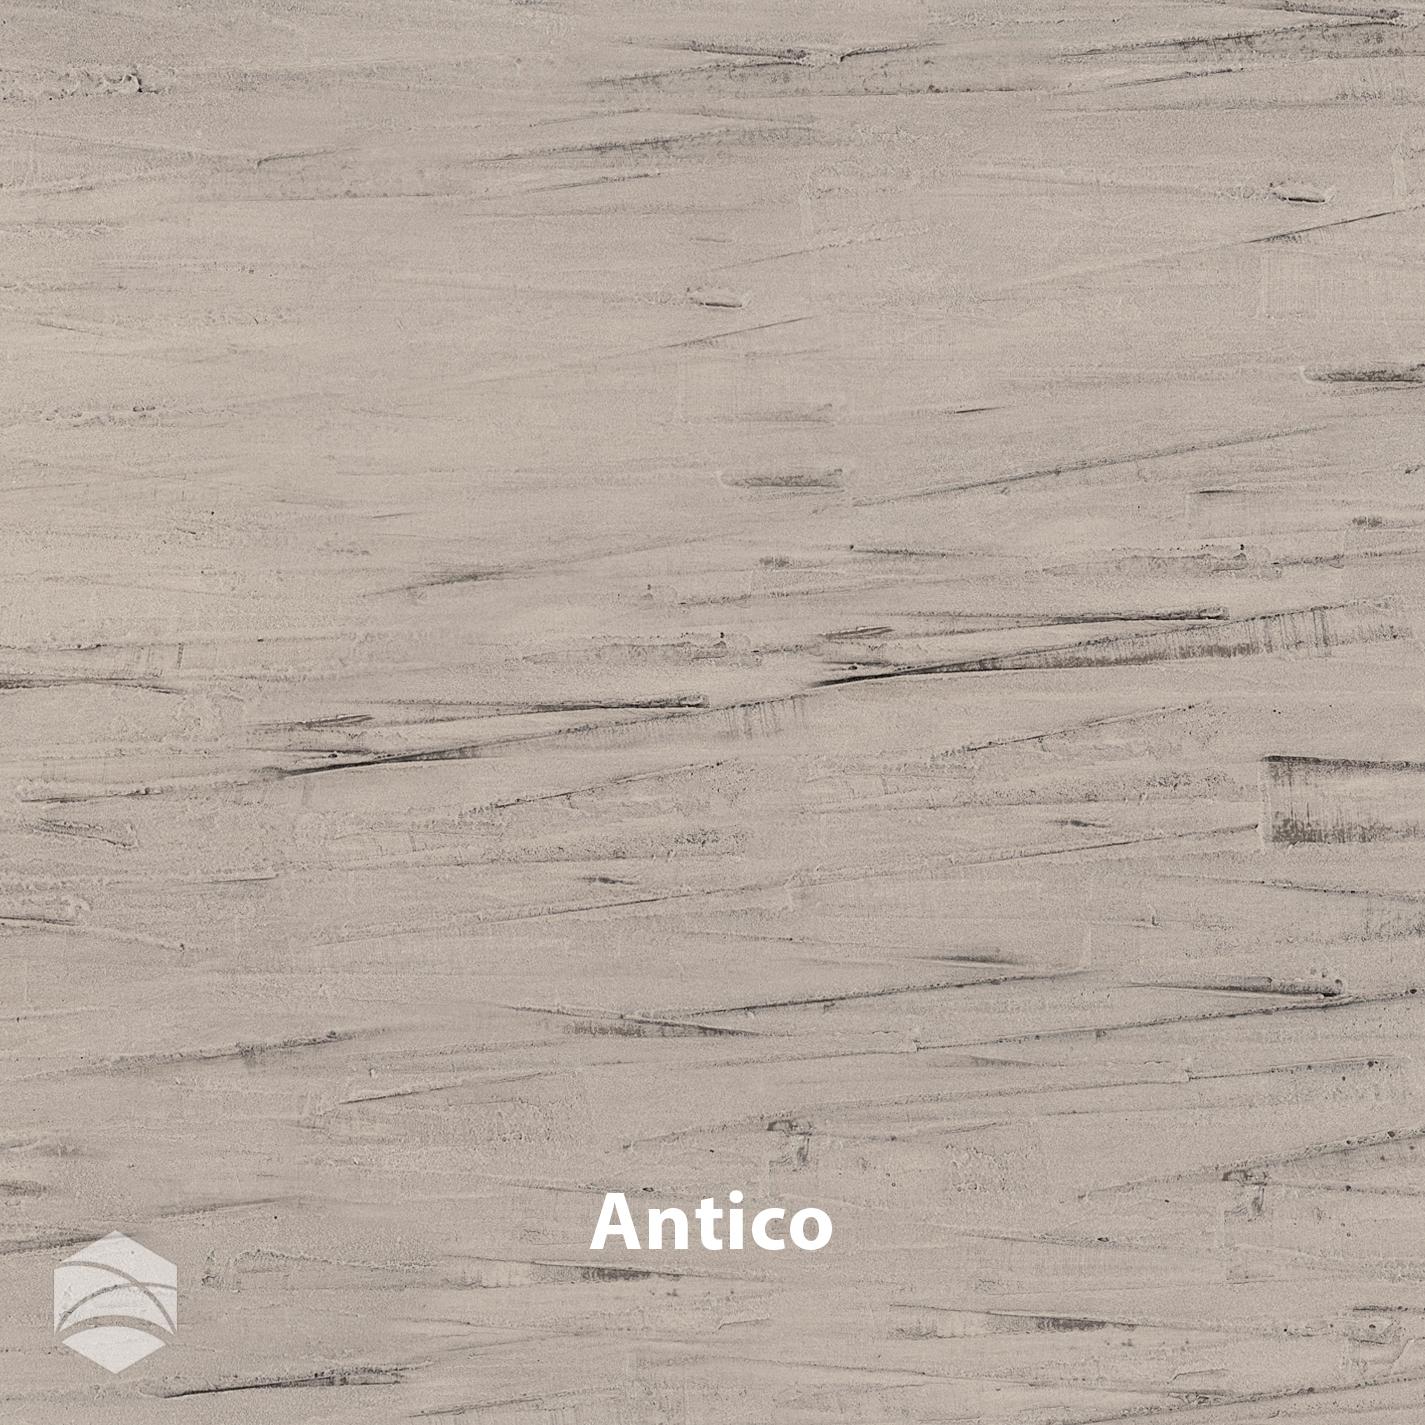 Antico_V2_14x14.jpg